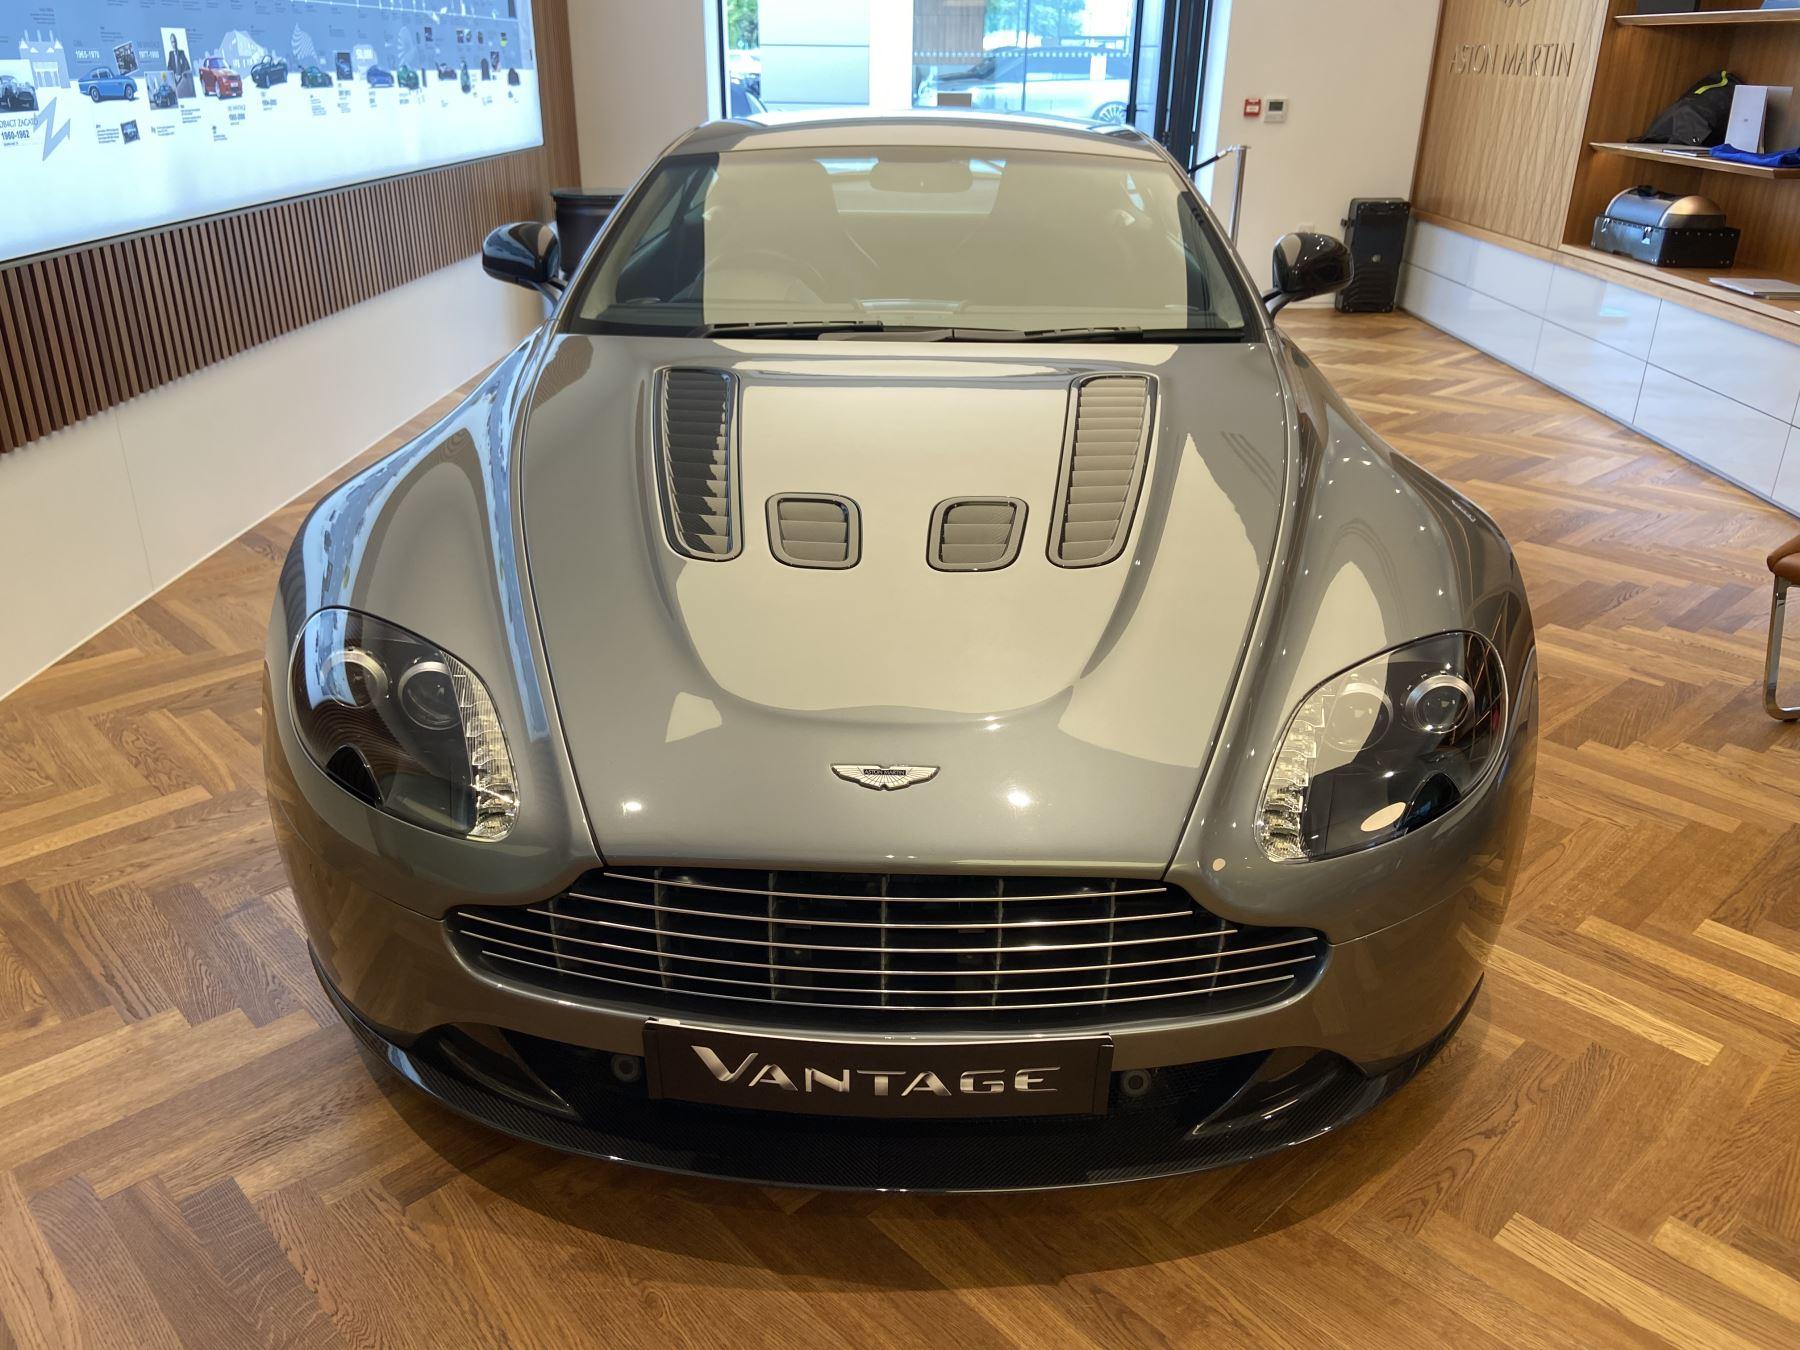 Aston Martin V12 Vantage 2dr Lightweight Seats and BandO 5.9 3 door Coupe